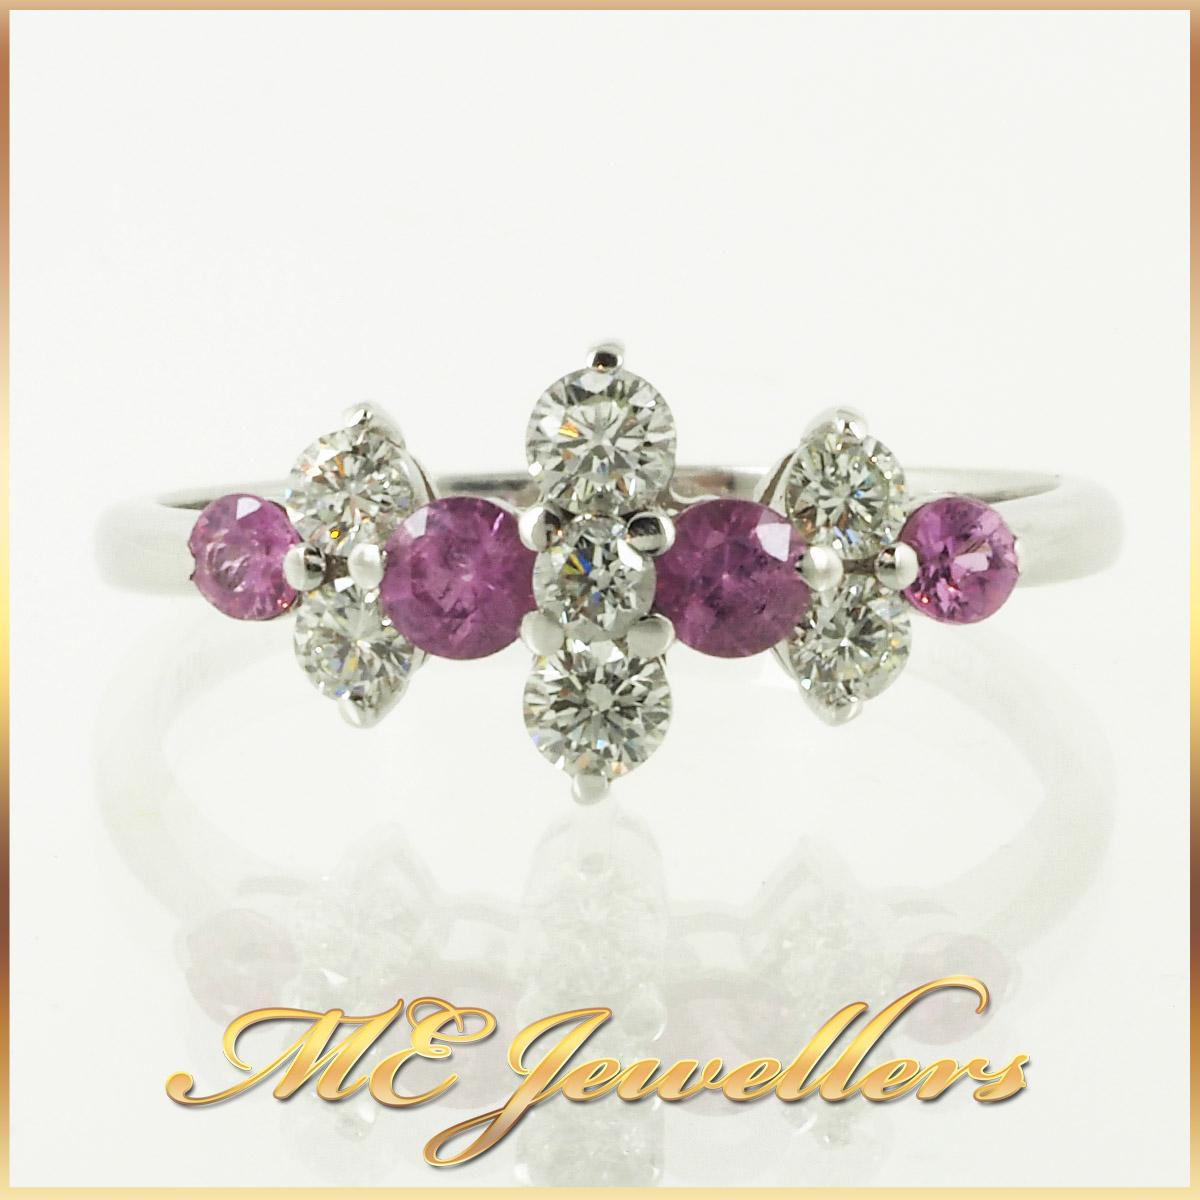 6762_diamond-pink sapphire-ring-18k-white-gold-4